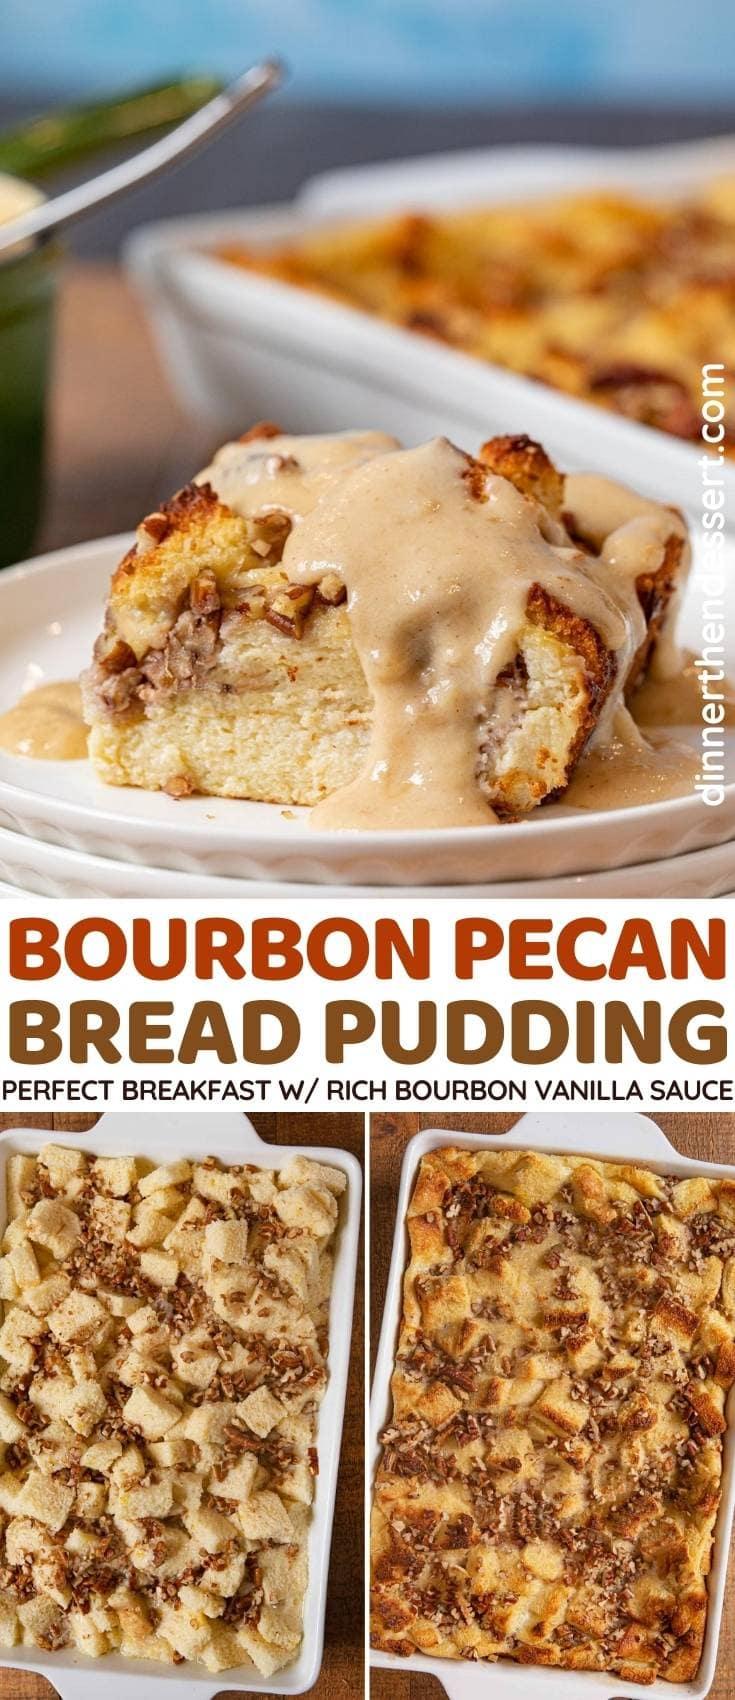 Bourbon Pecan Bread Pudding collage